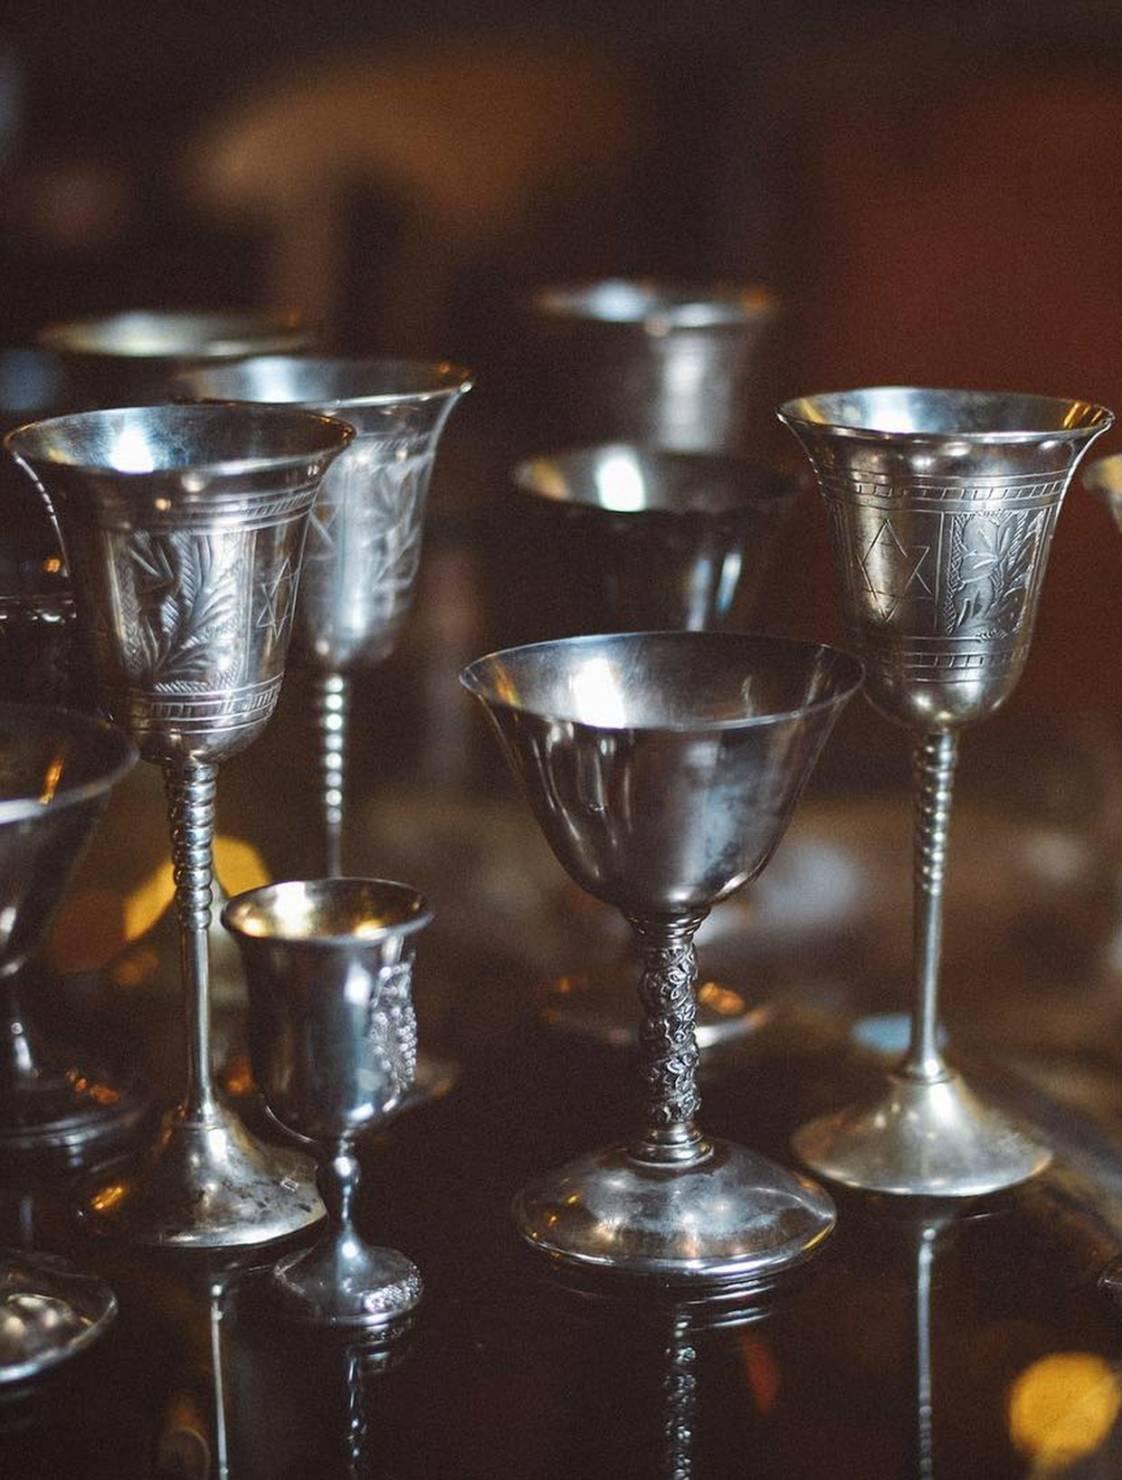 mitzva bar, еврейский бар, этно бар, еврейская кухня, авторские коктейли, гестбартендинг, made in china